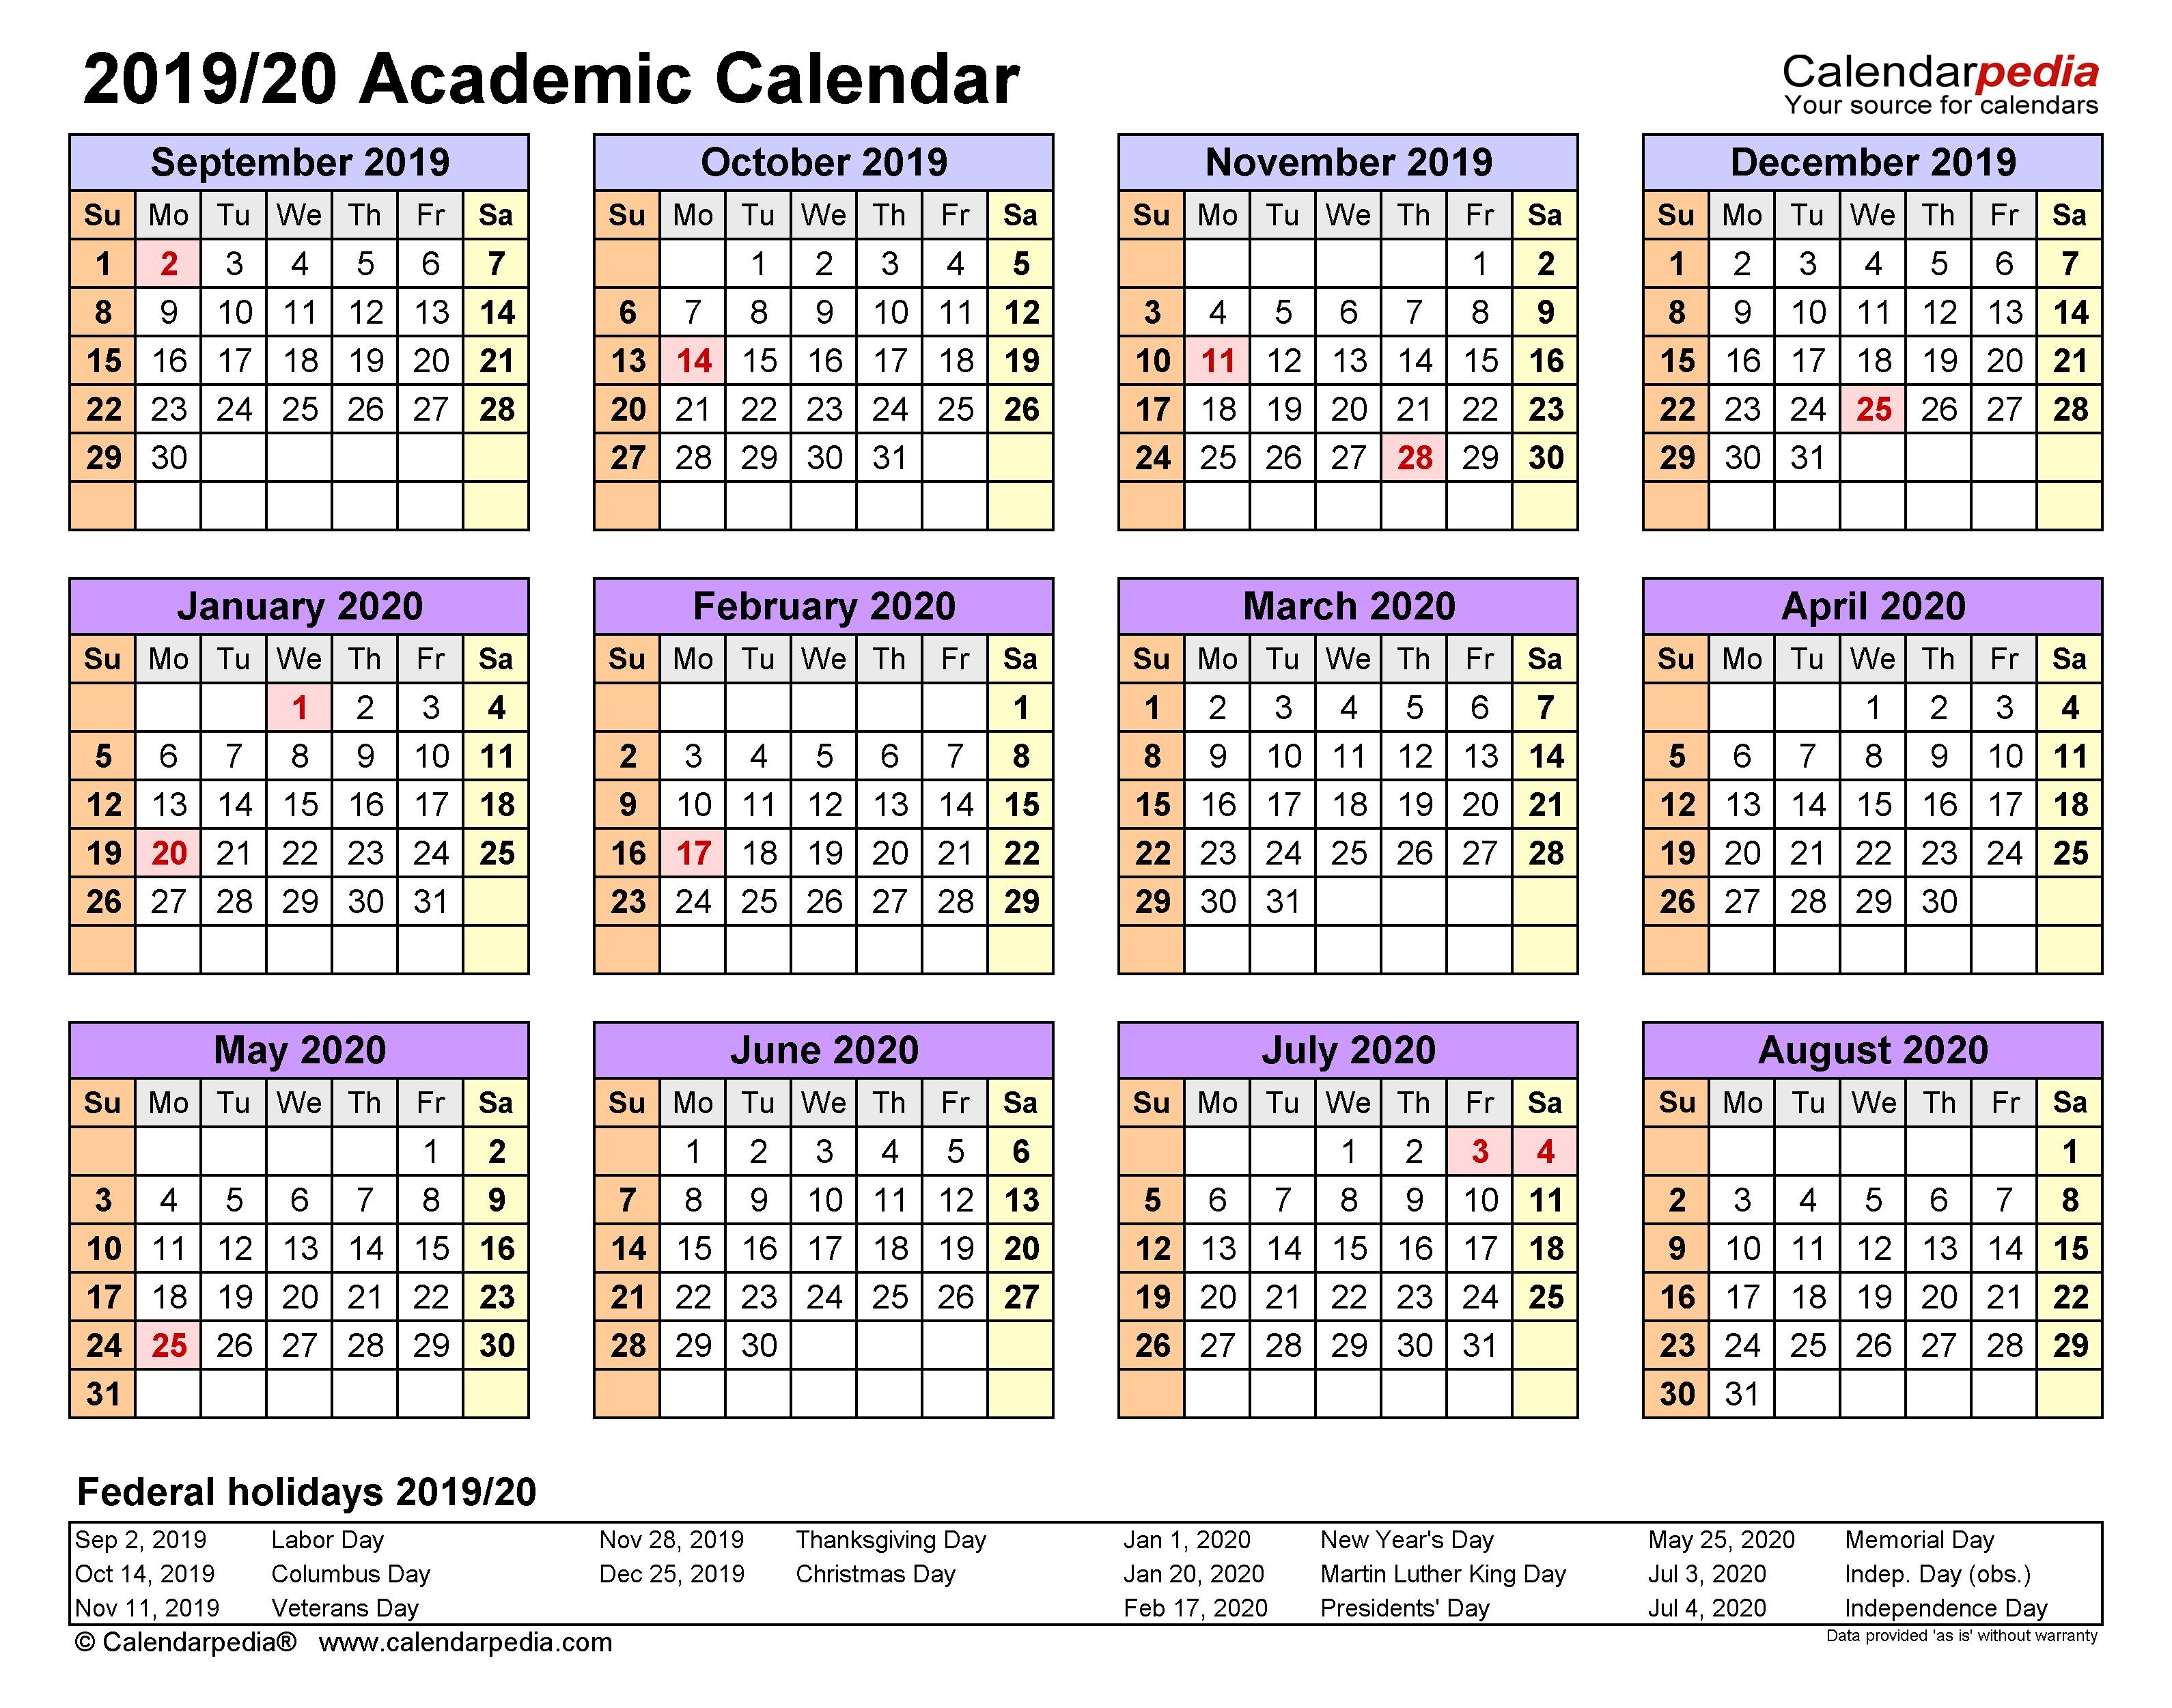 Academic Calendars 2019/2020 - Free Printable Word Templates in U Of T 2020-2021 Academic Calendar